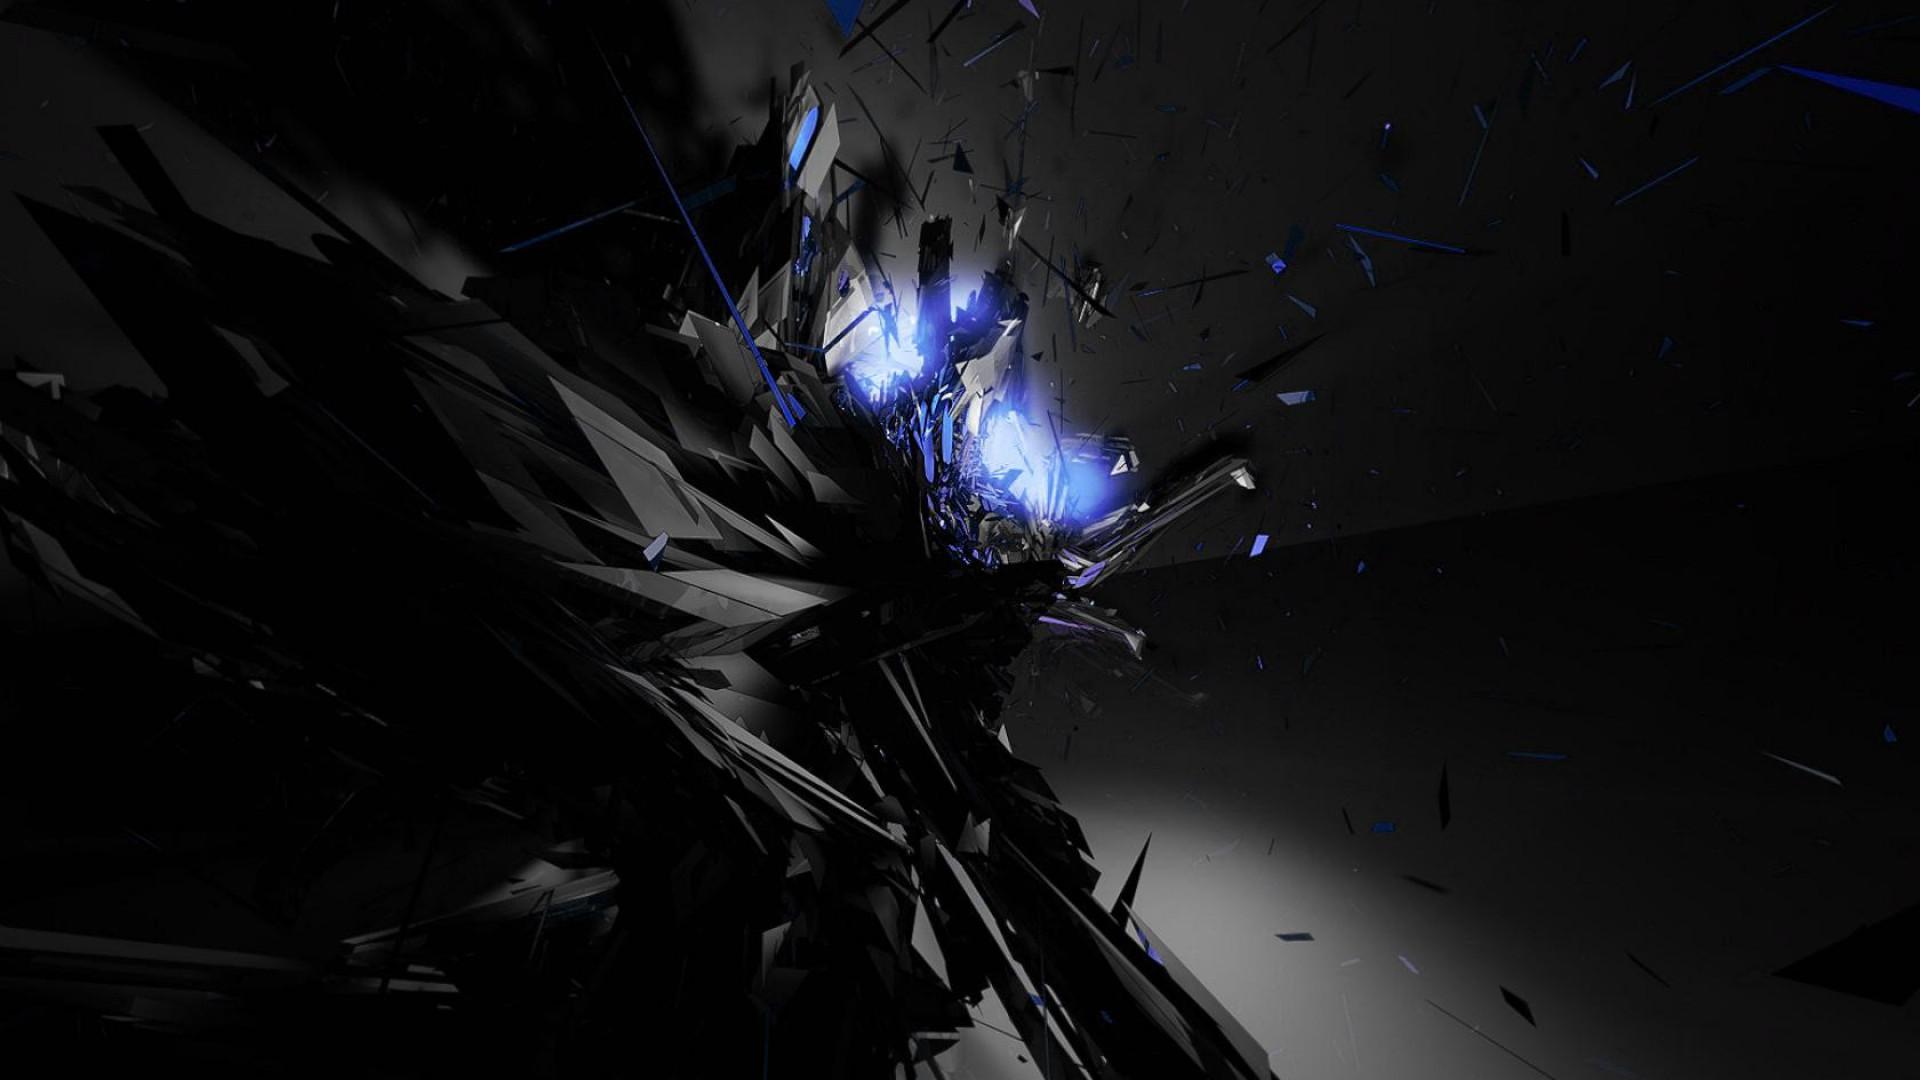 Dark Abstract Hd Wallpapers 1080p Djiwallpaper Co